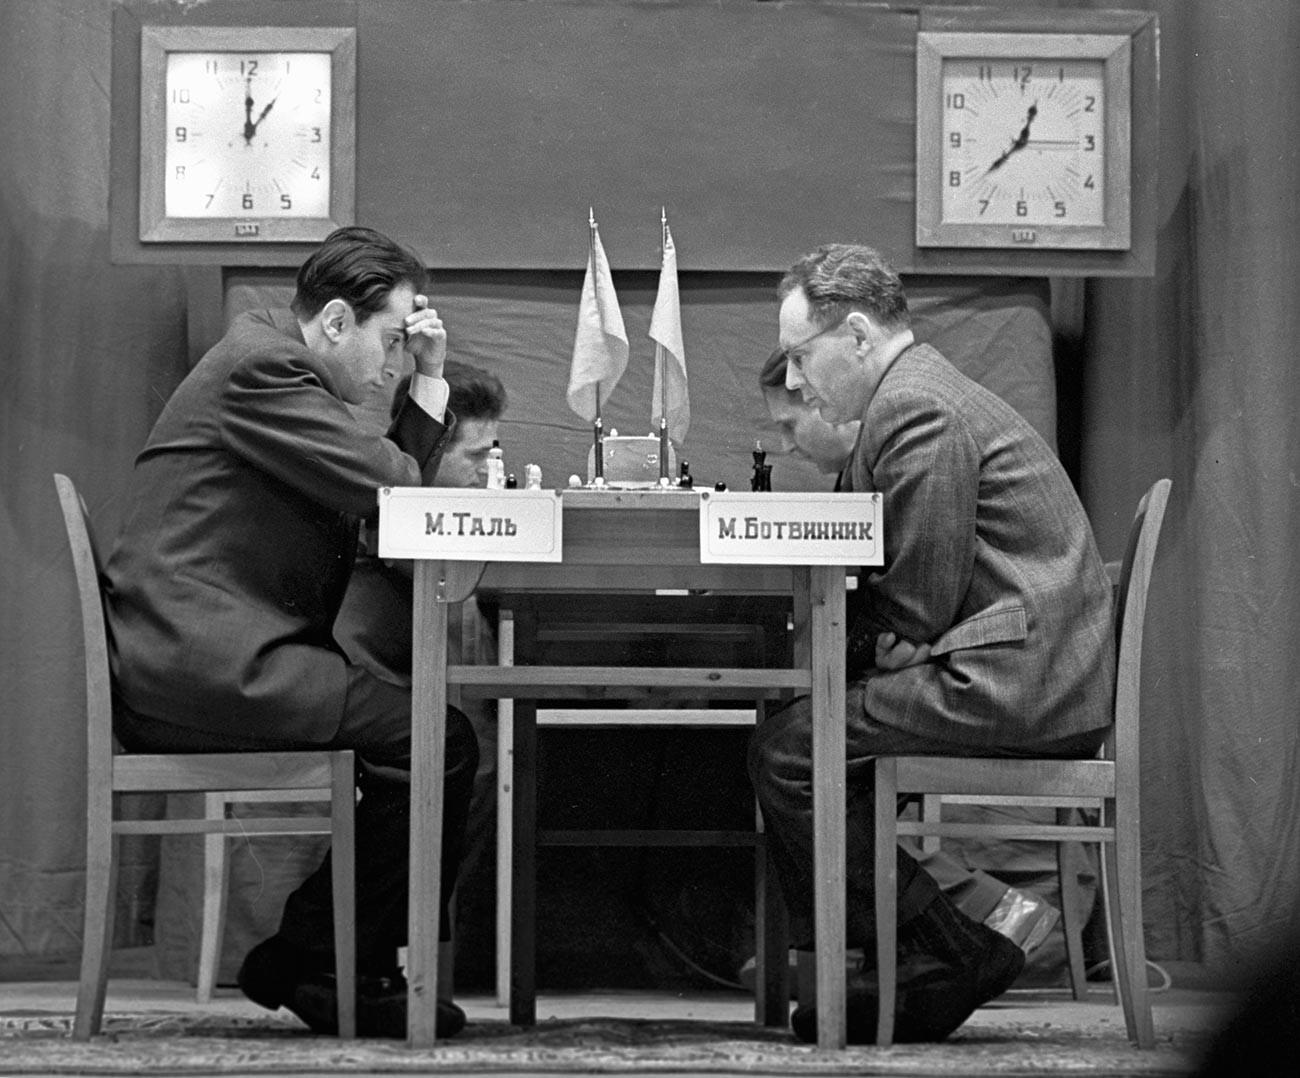 Tal contro Botvinnik, 1960